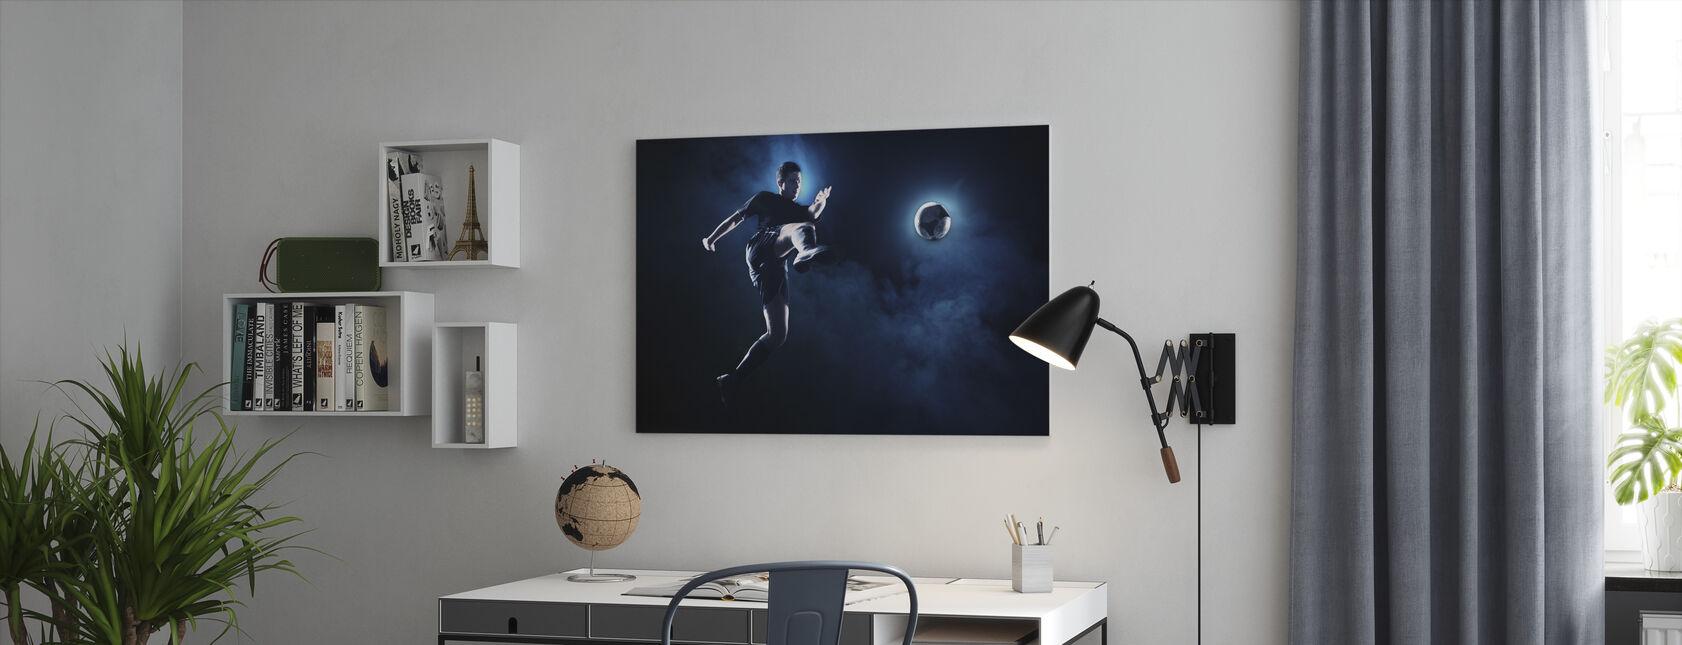 Blue Smoke Soccer - Canvas print - Office